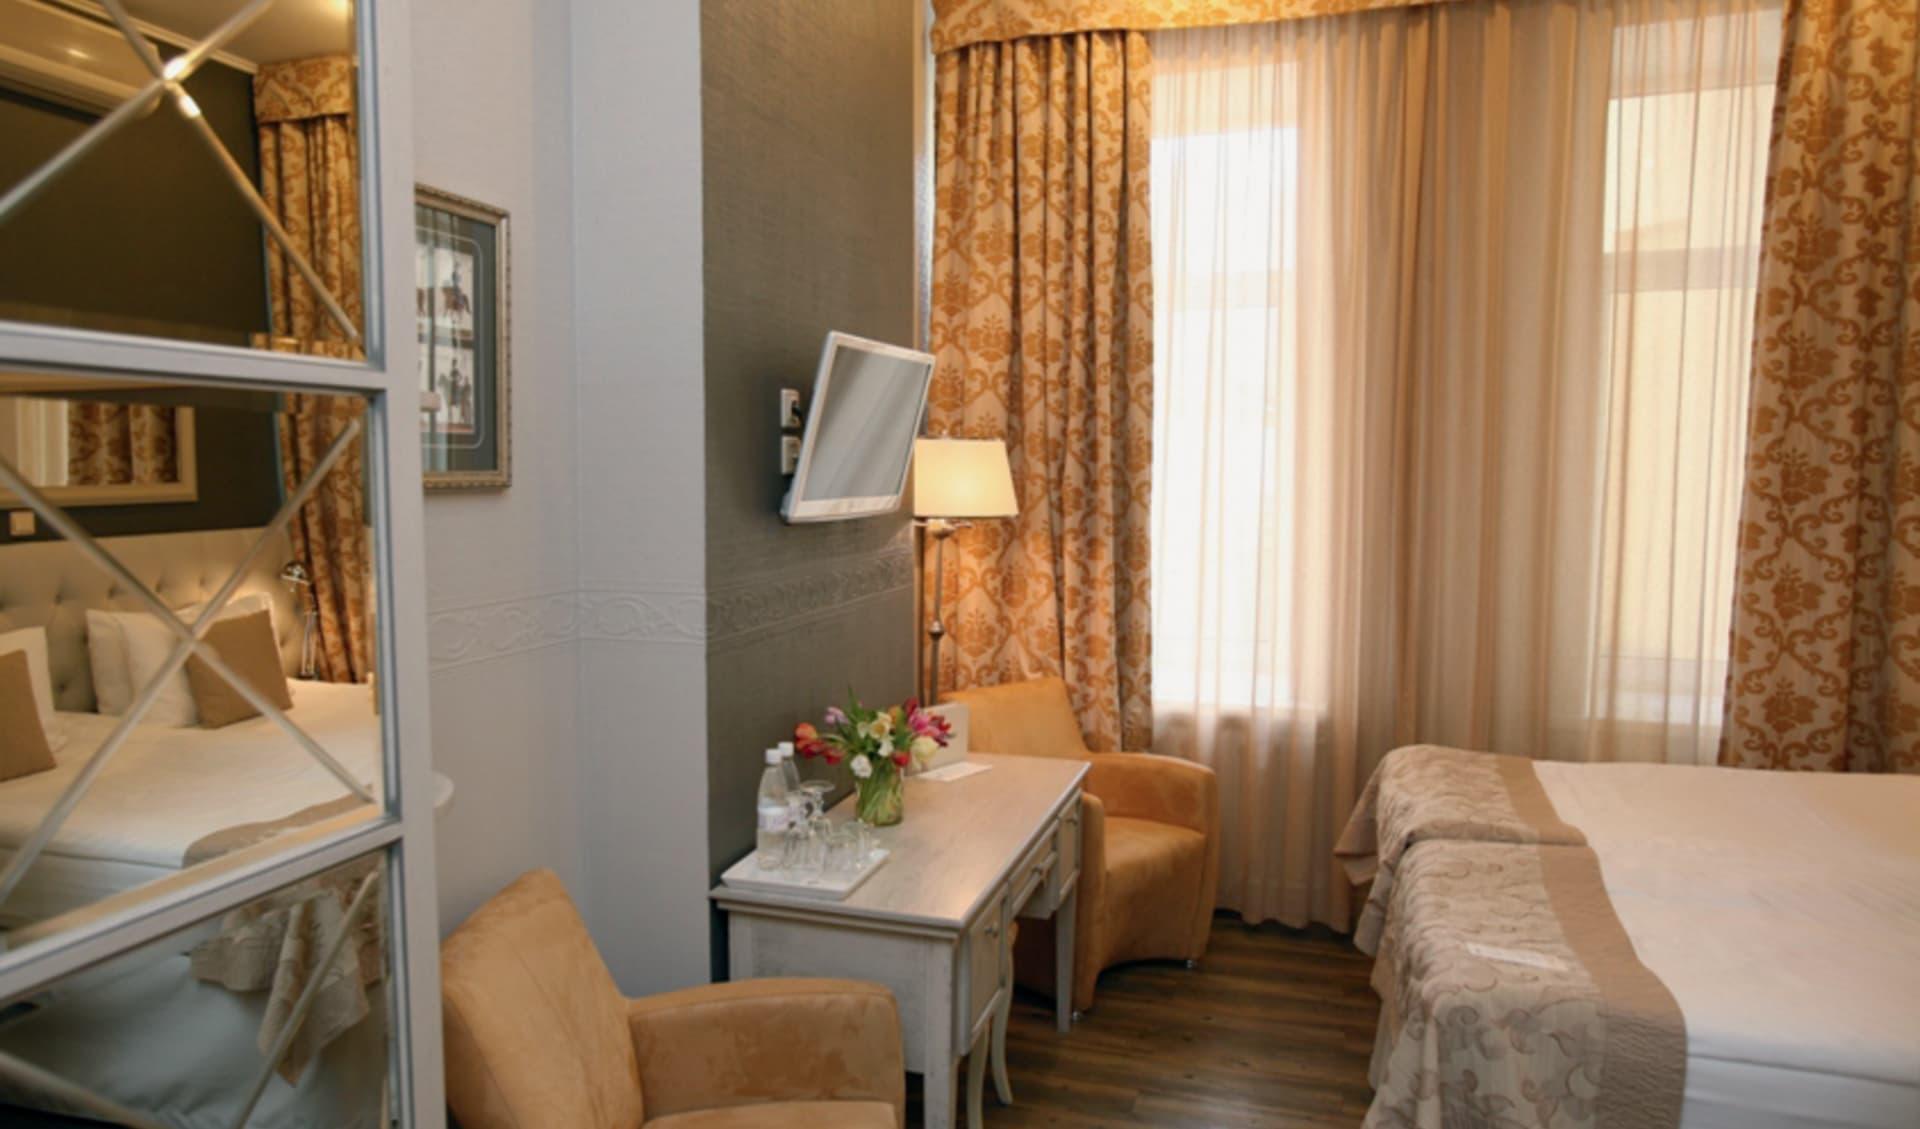 Hotel Pushka Inn in St. Petersburg: Russland_St.Petersburg_PushkaInn_Zimmer